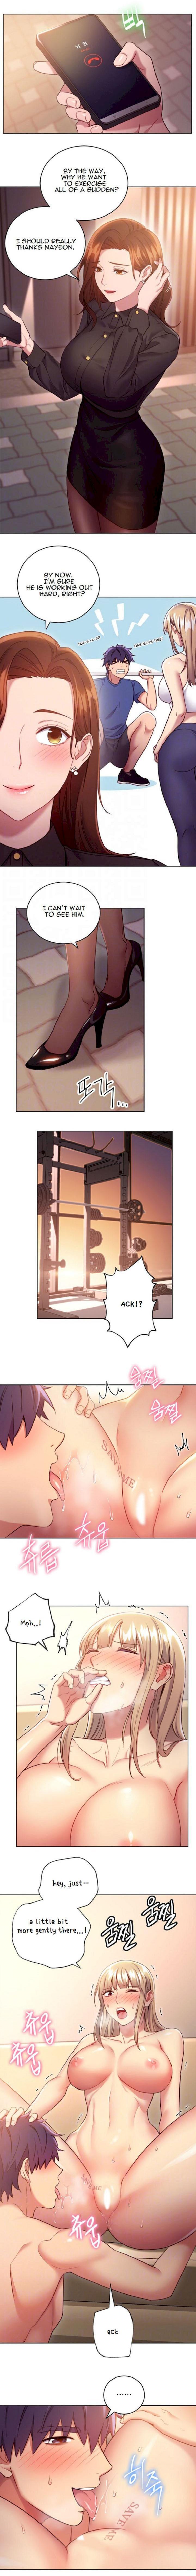 [Neck Pilllow] Stepmother Friends Ch.40/? [English] [Hentai Universe] NEW! 22/10/2020 170